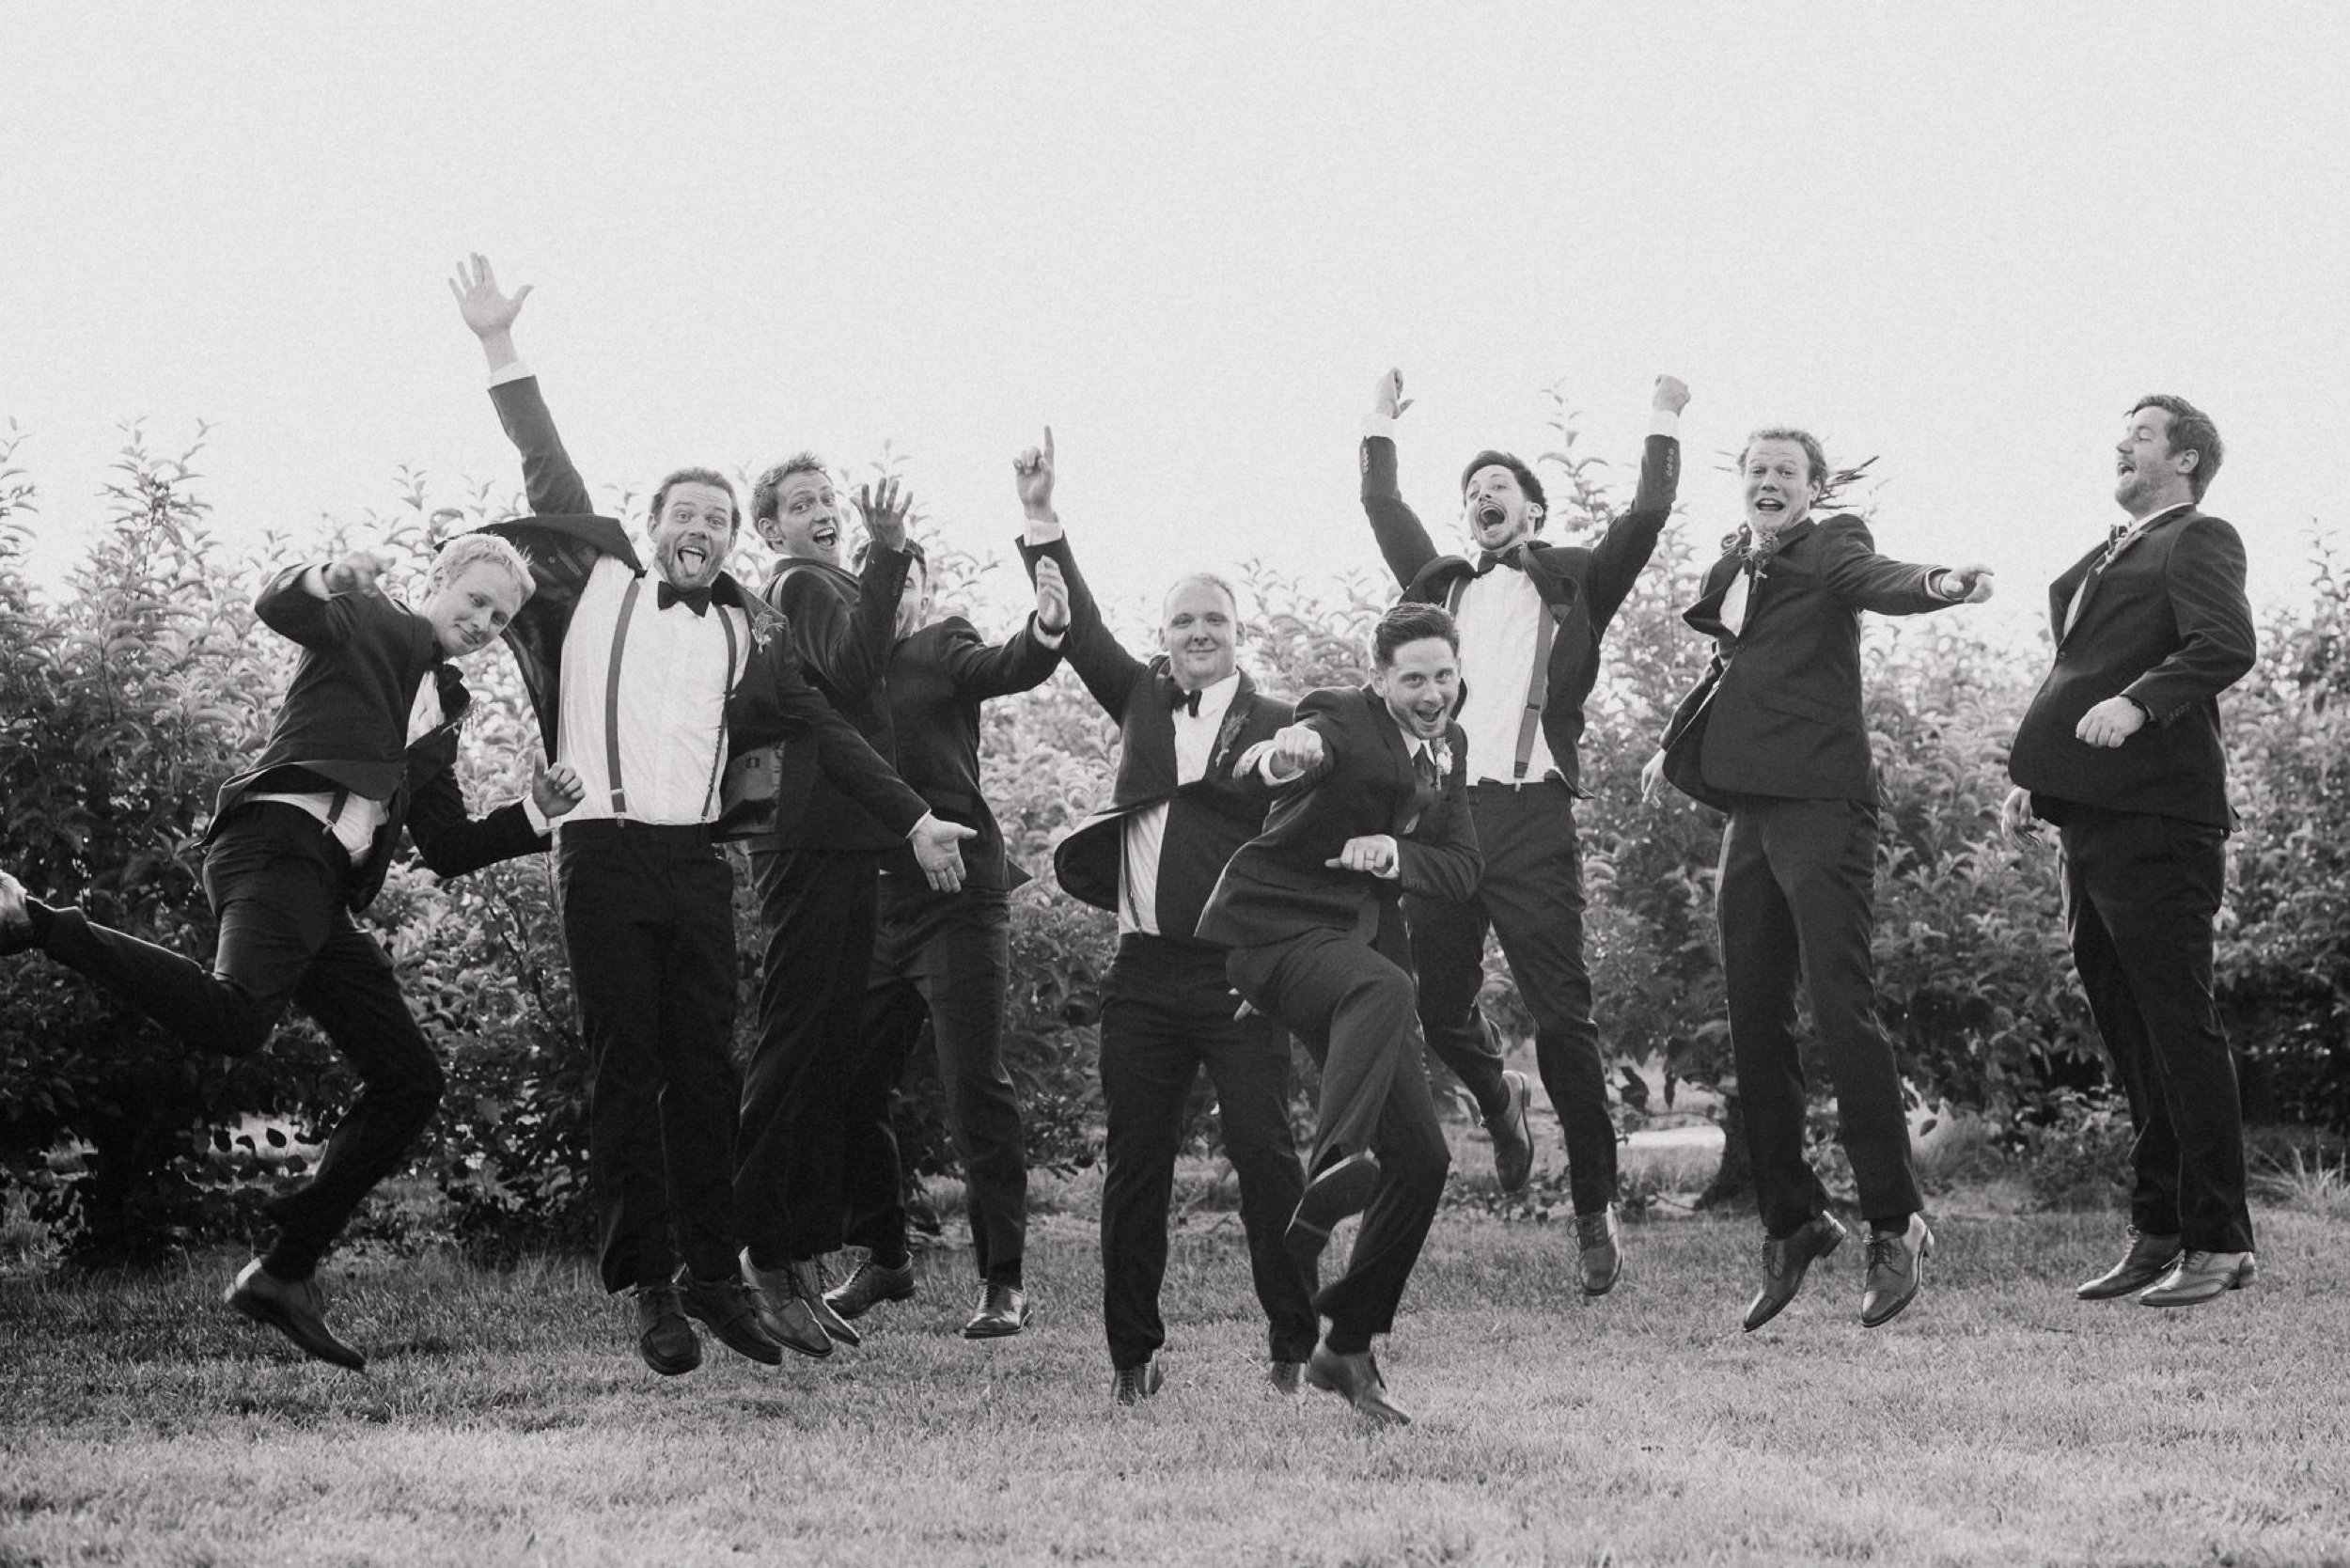 milburn_farms-wedding-60.jpg